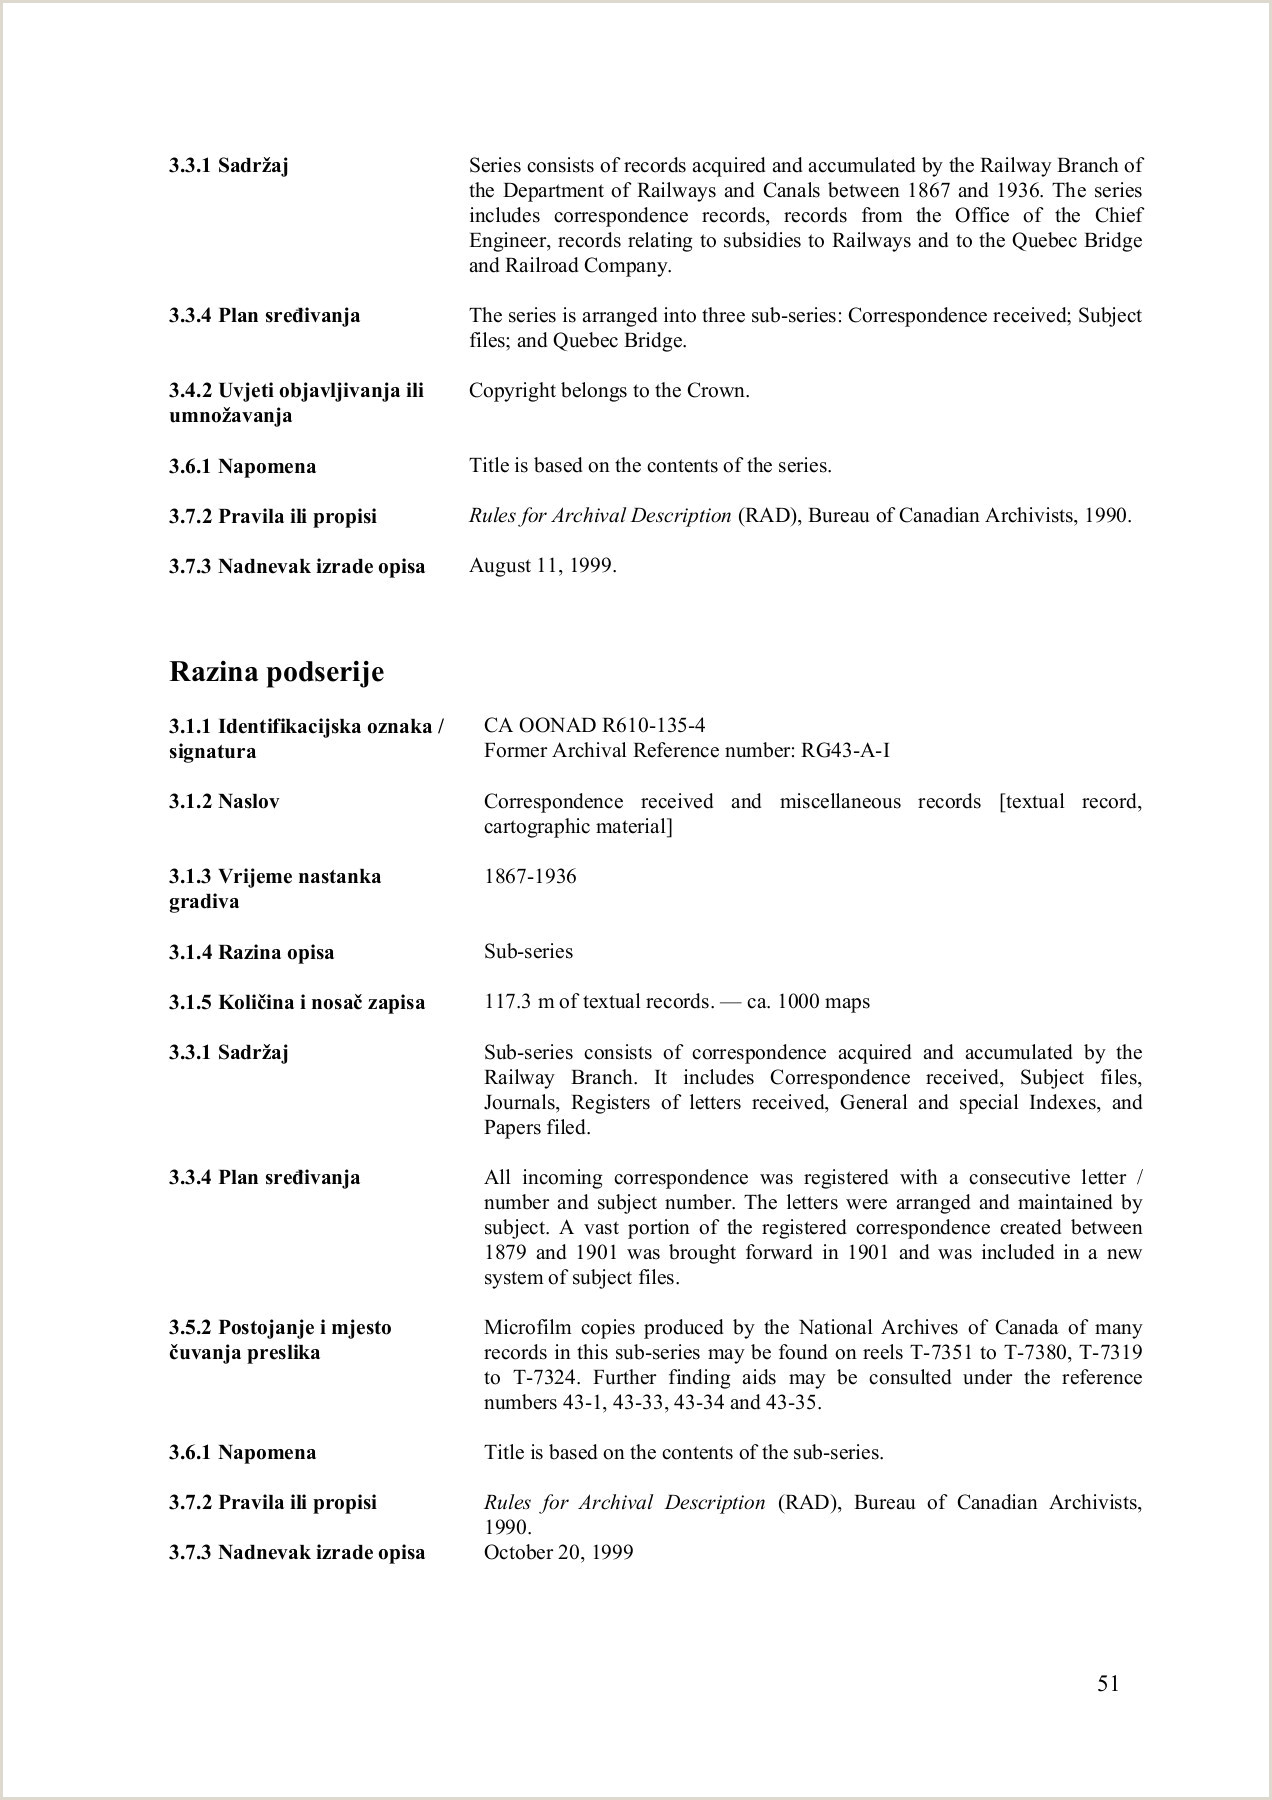 Formato Hoja De Vida Jne 2018 isad G 2 Izd Hrv Pages 51 100 Text Version